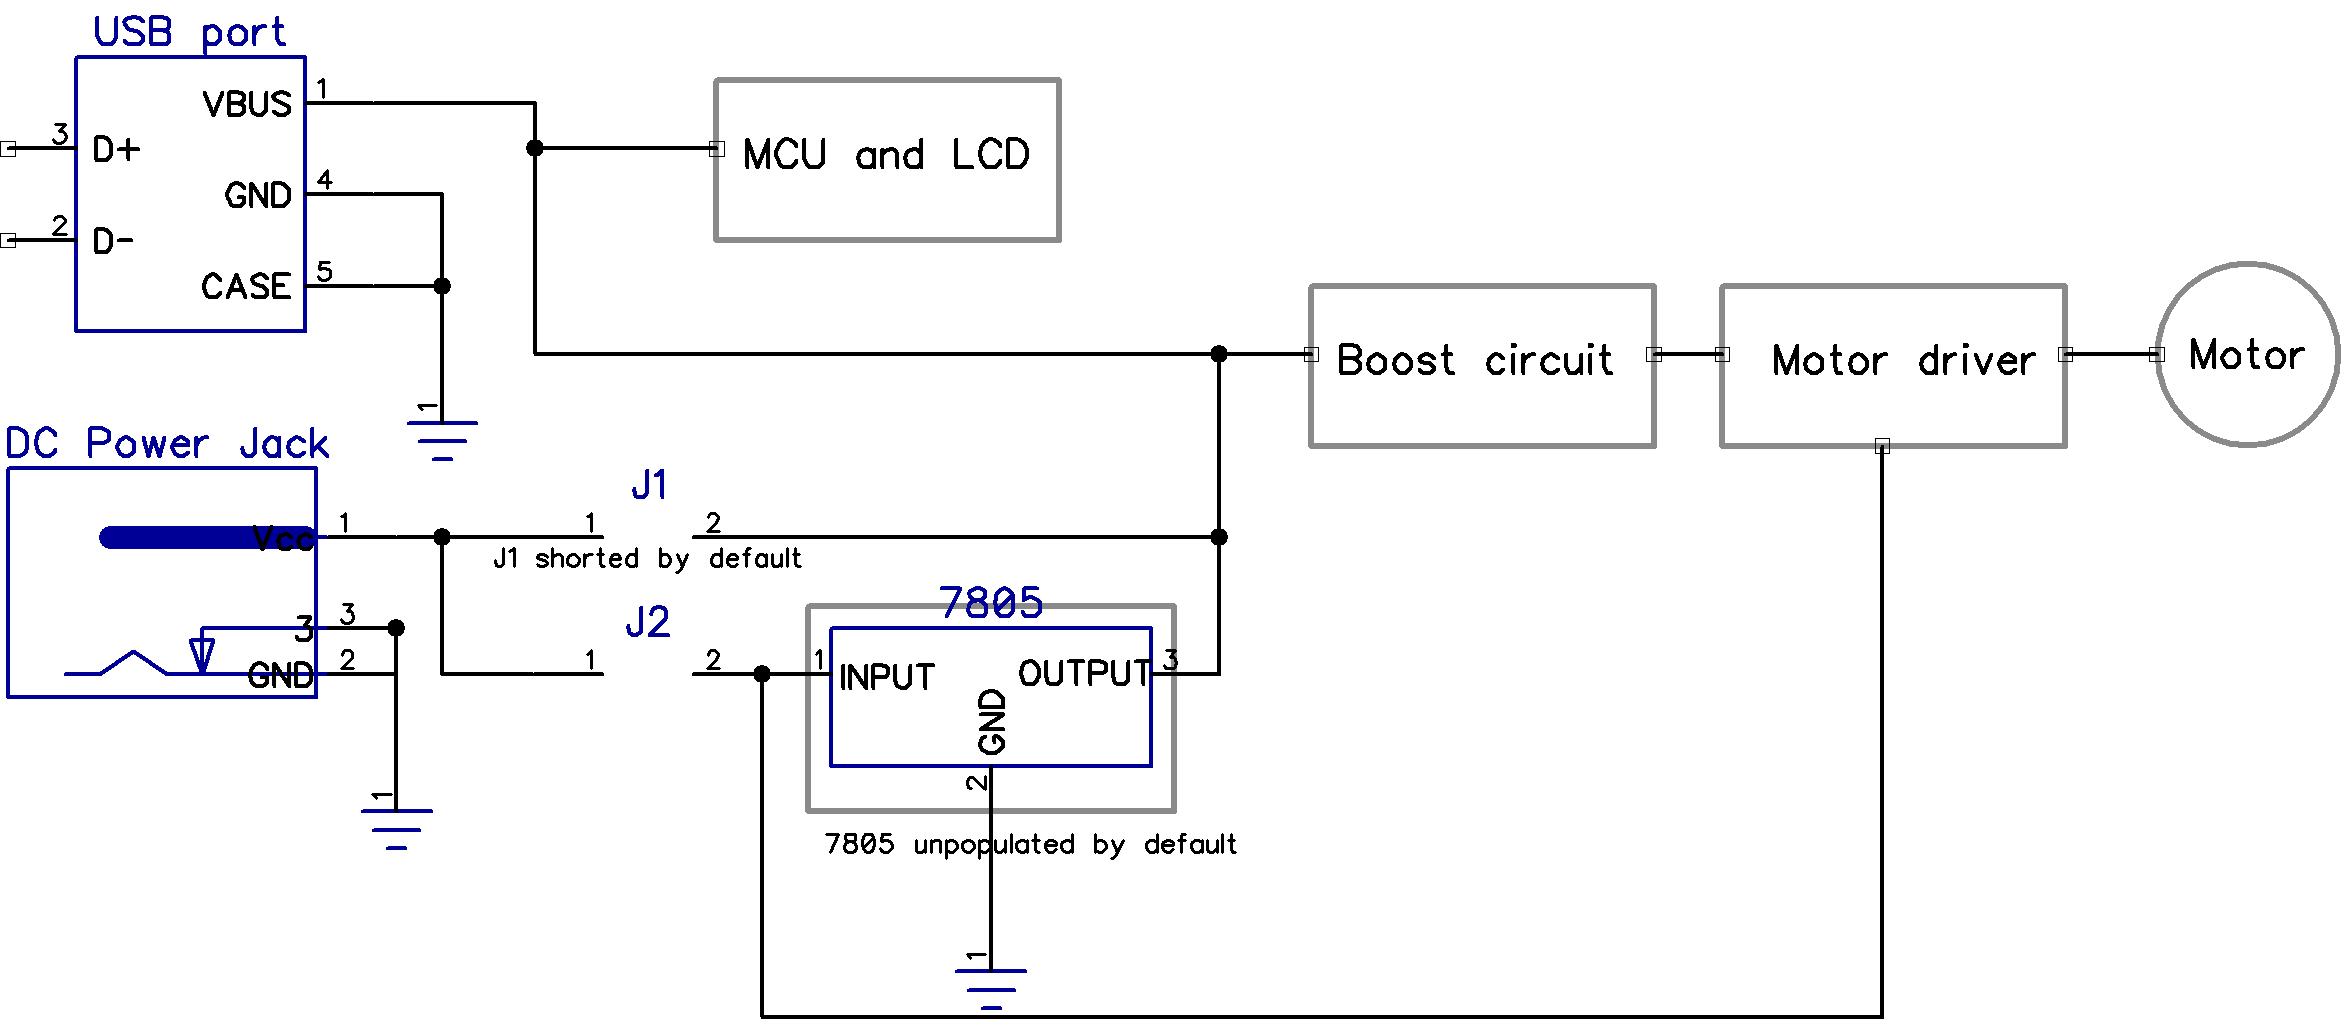 [SCHEMATICS_48EU]  Using the DC power jack | Dc Power Jack Schematic |  | DM – Solder paste and adhesive dispenser - WordPress.com